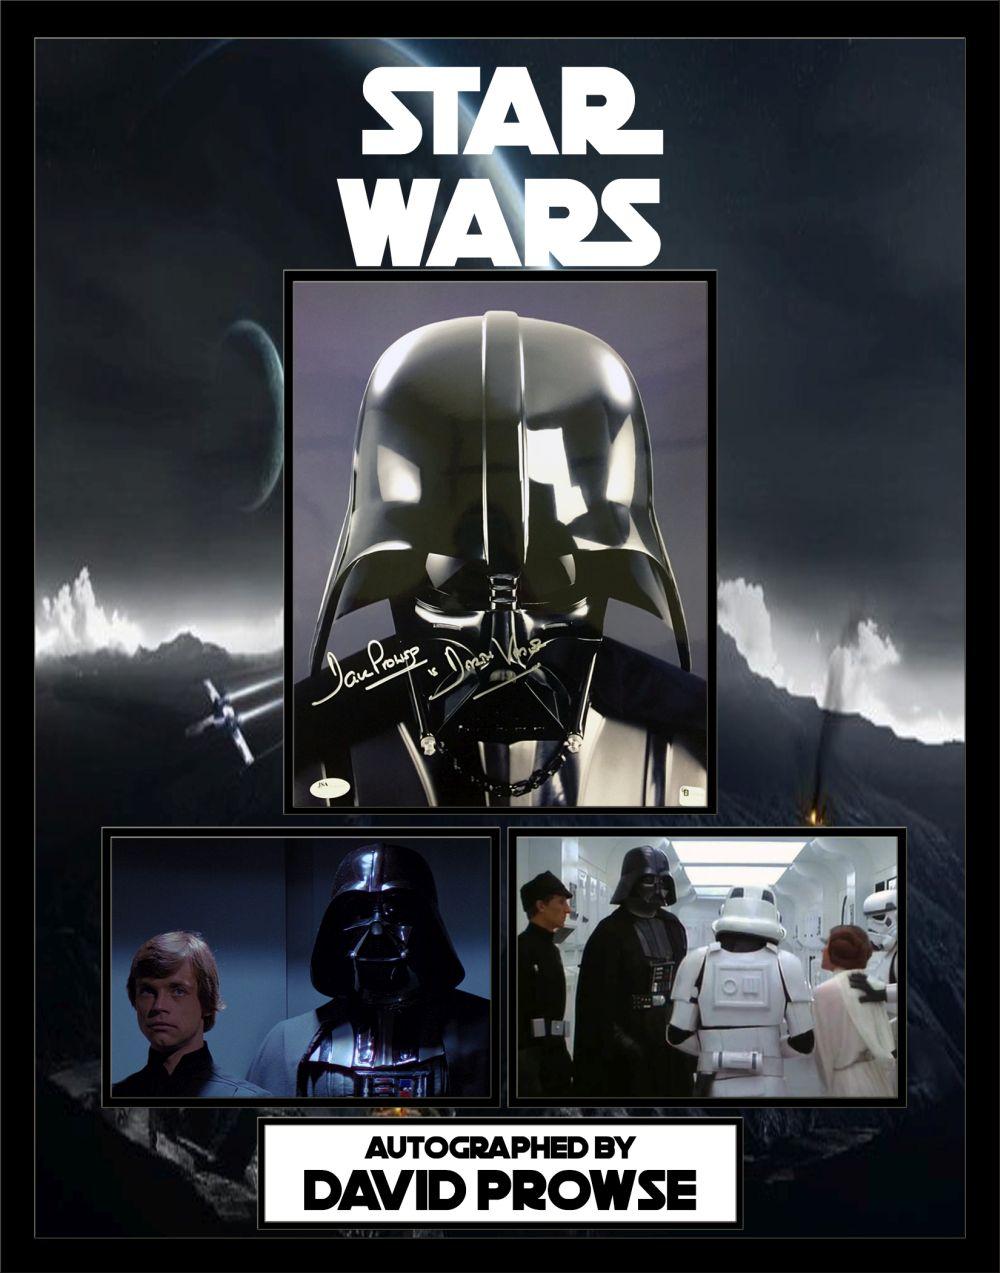 Star Wars Darth Vader Collage